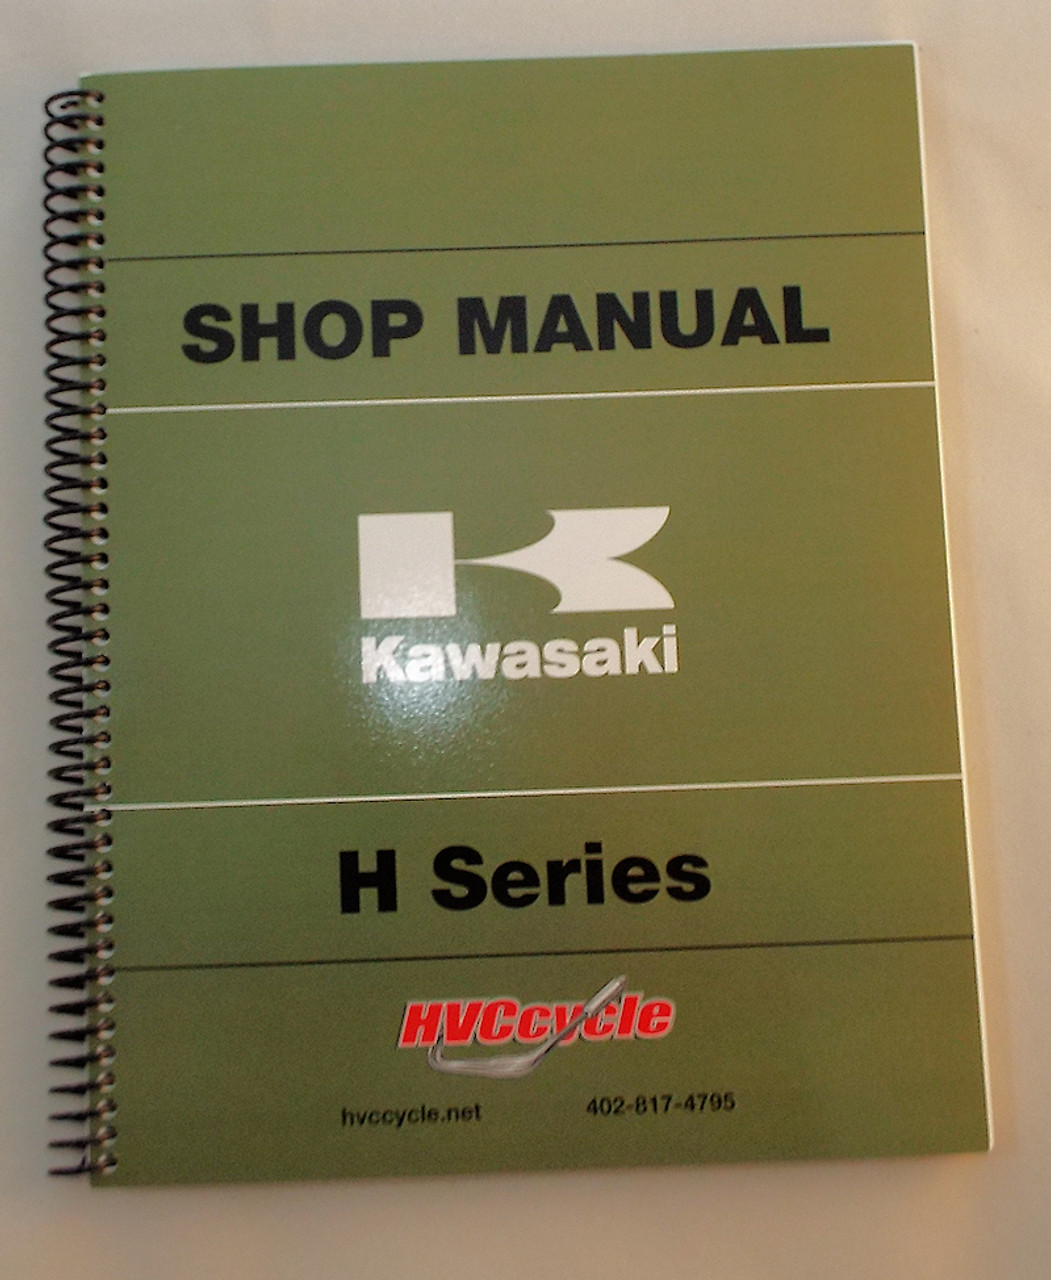 kawasaki wiring diagram for 1969 1972 h1 triple [ 1051 x 1280 Pixel ]